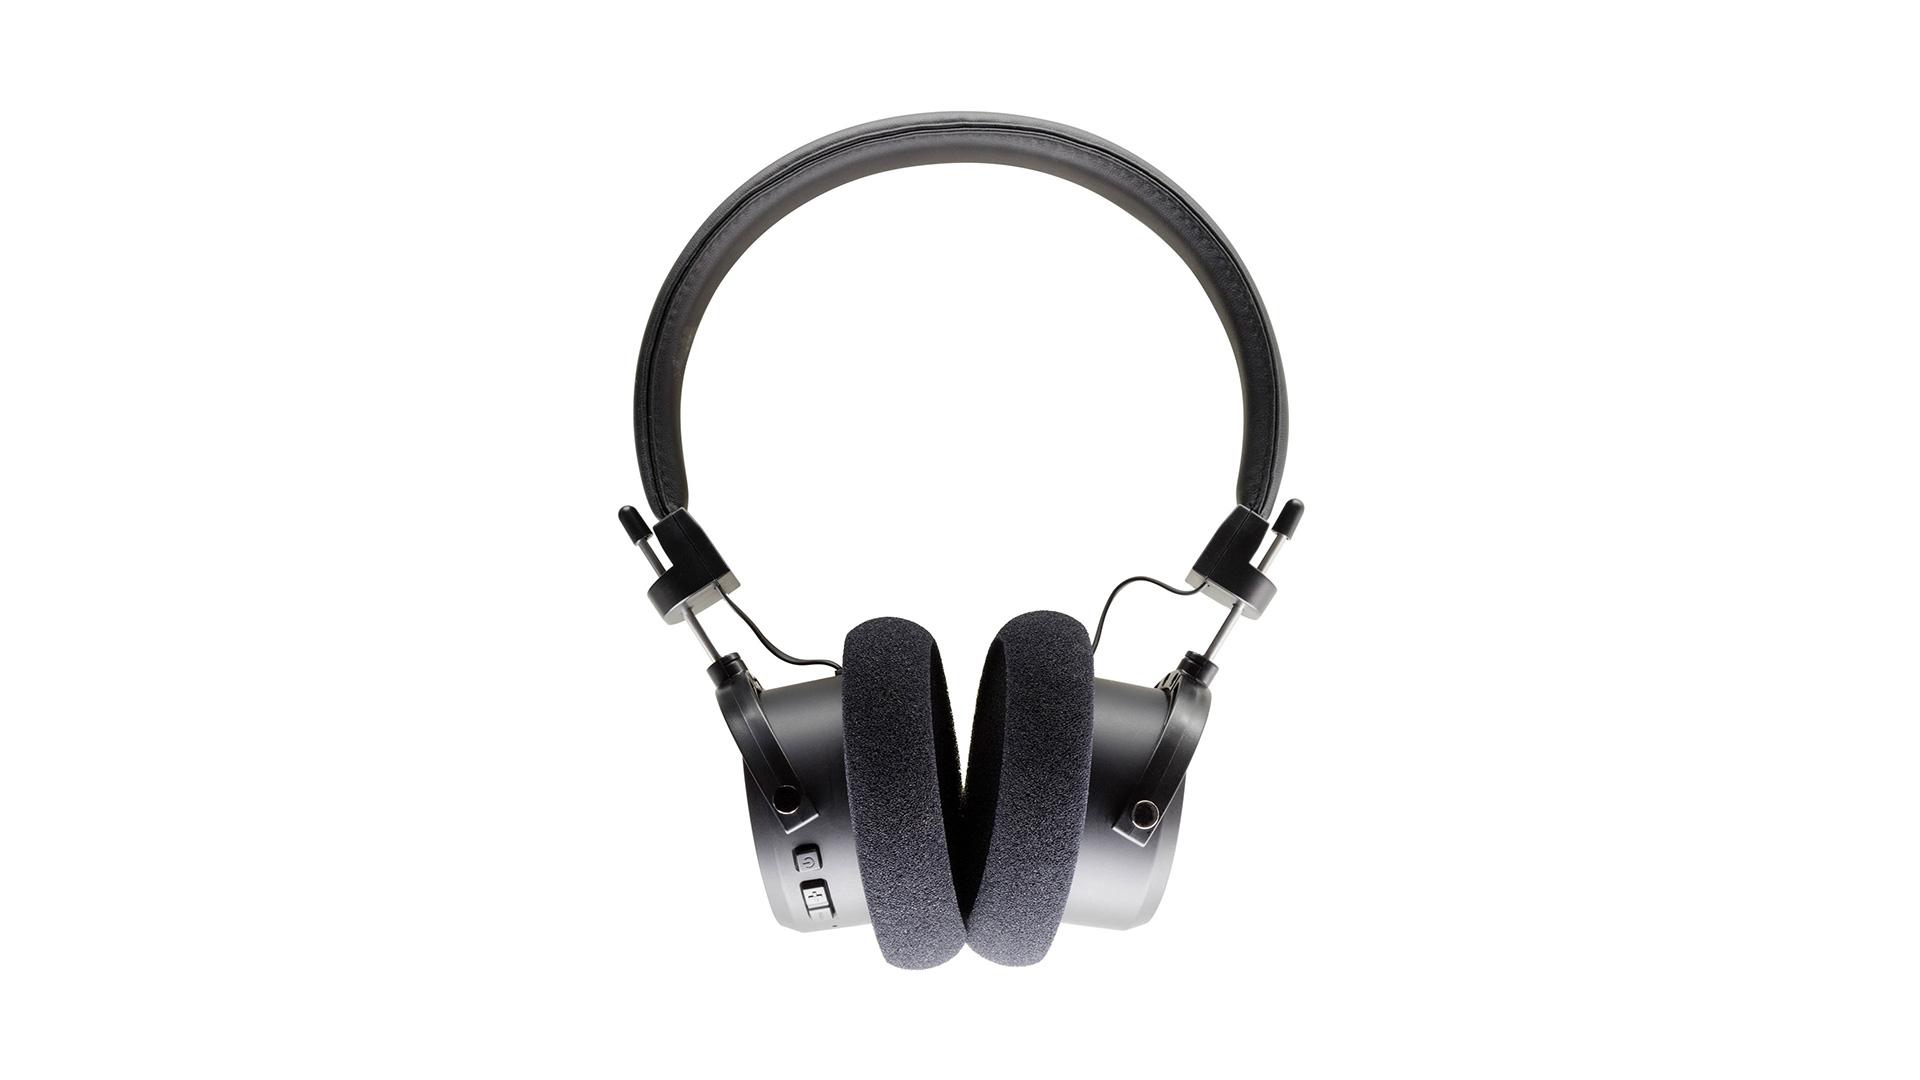 Grado GW100 Wireless Headphones at Creative Audio in Winnipeg